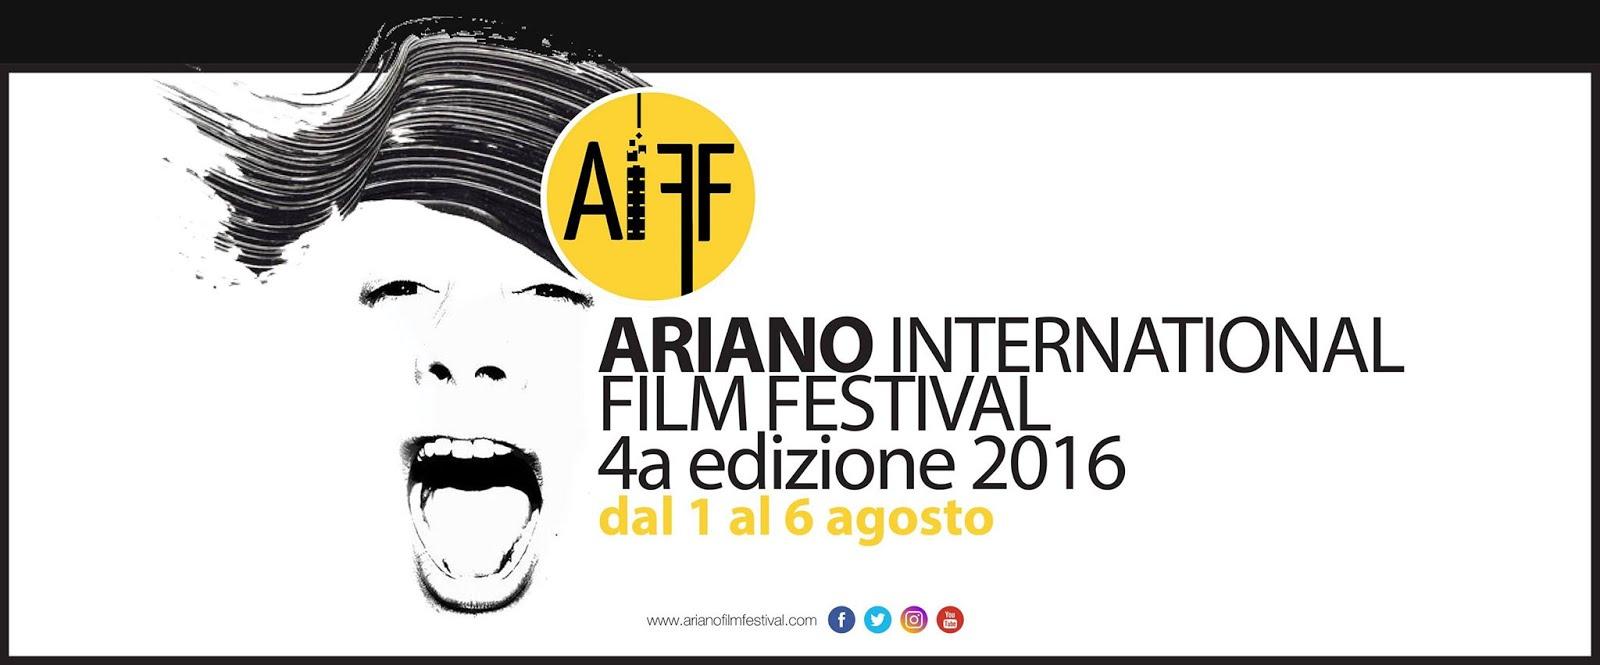 http://www.arianofilmfestival.com/